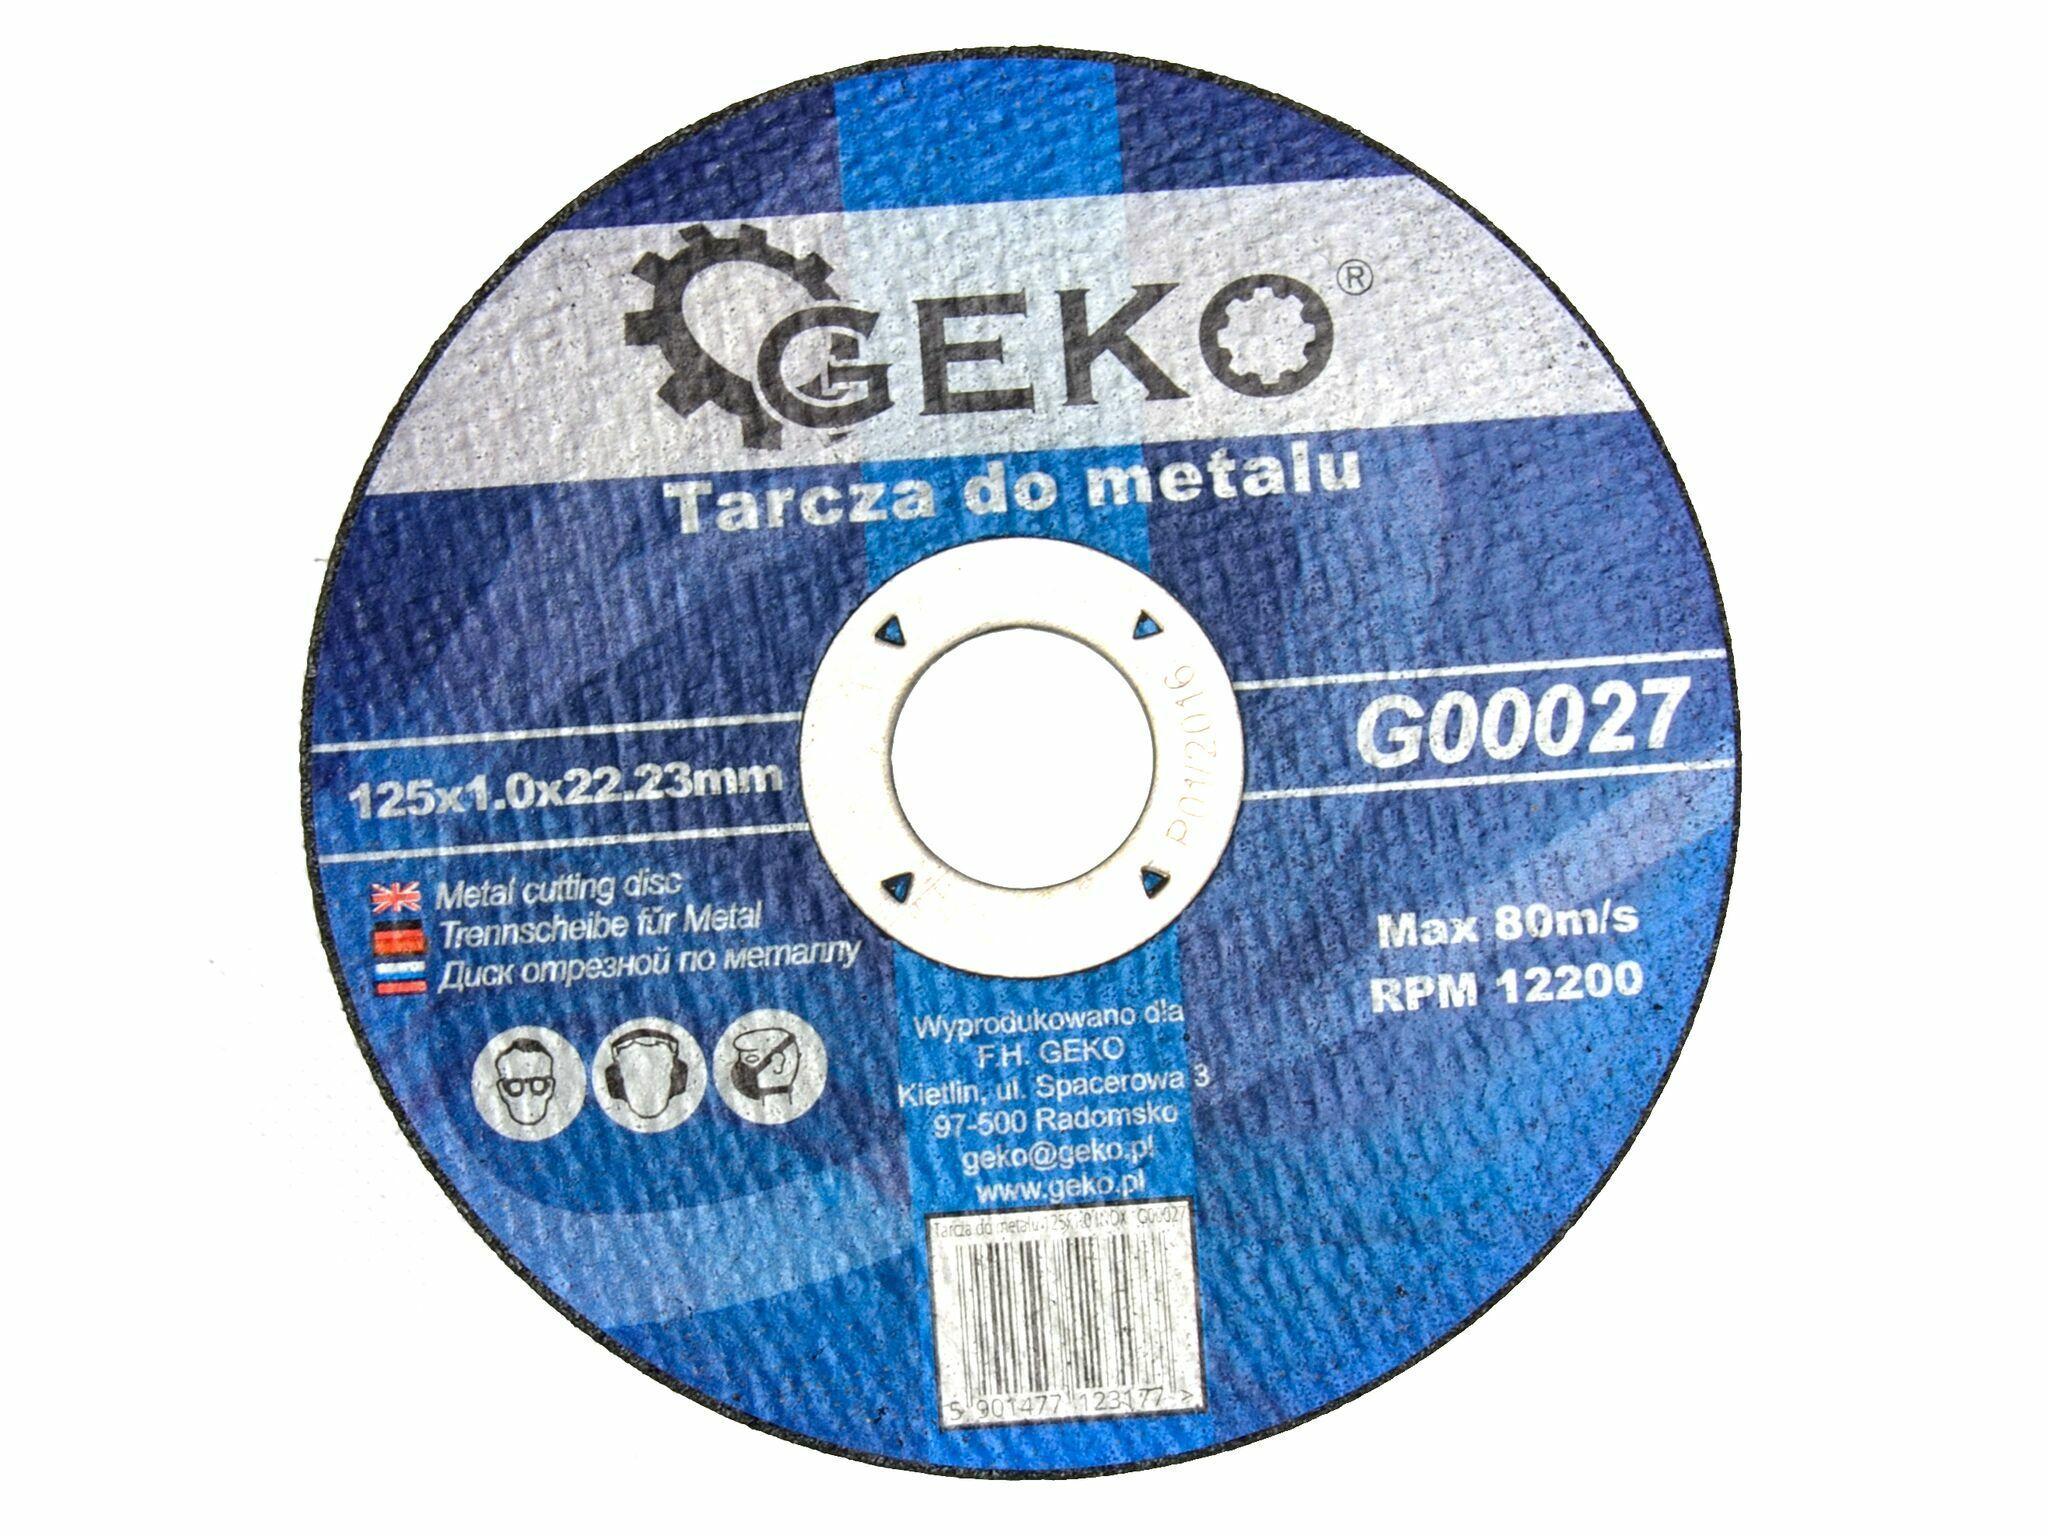 GEKO G00027 Řezný kotouč na ocel, 125x1,0mm